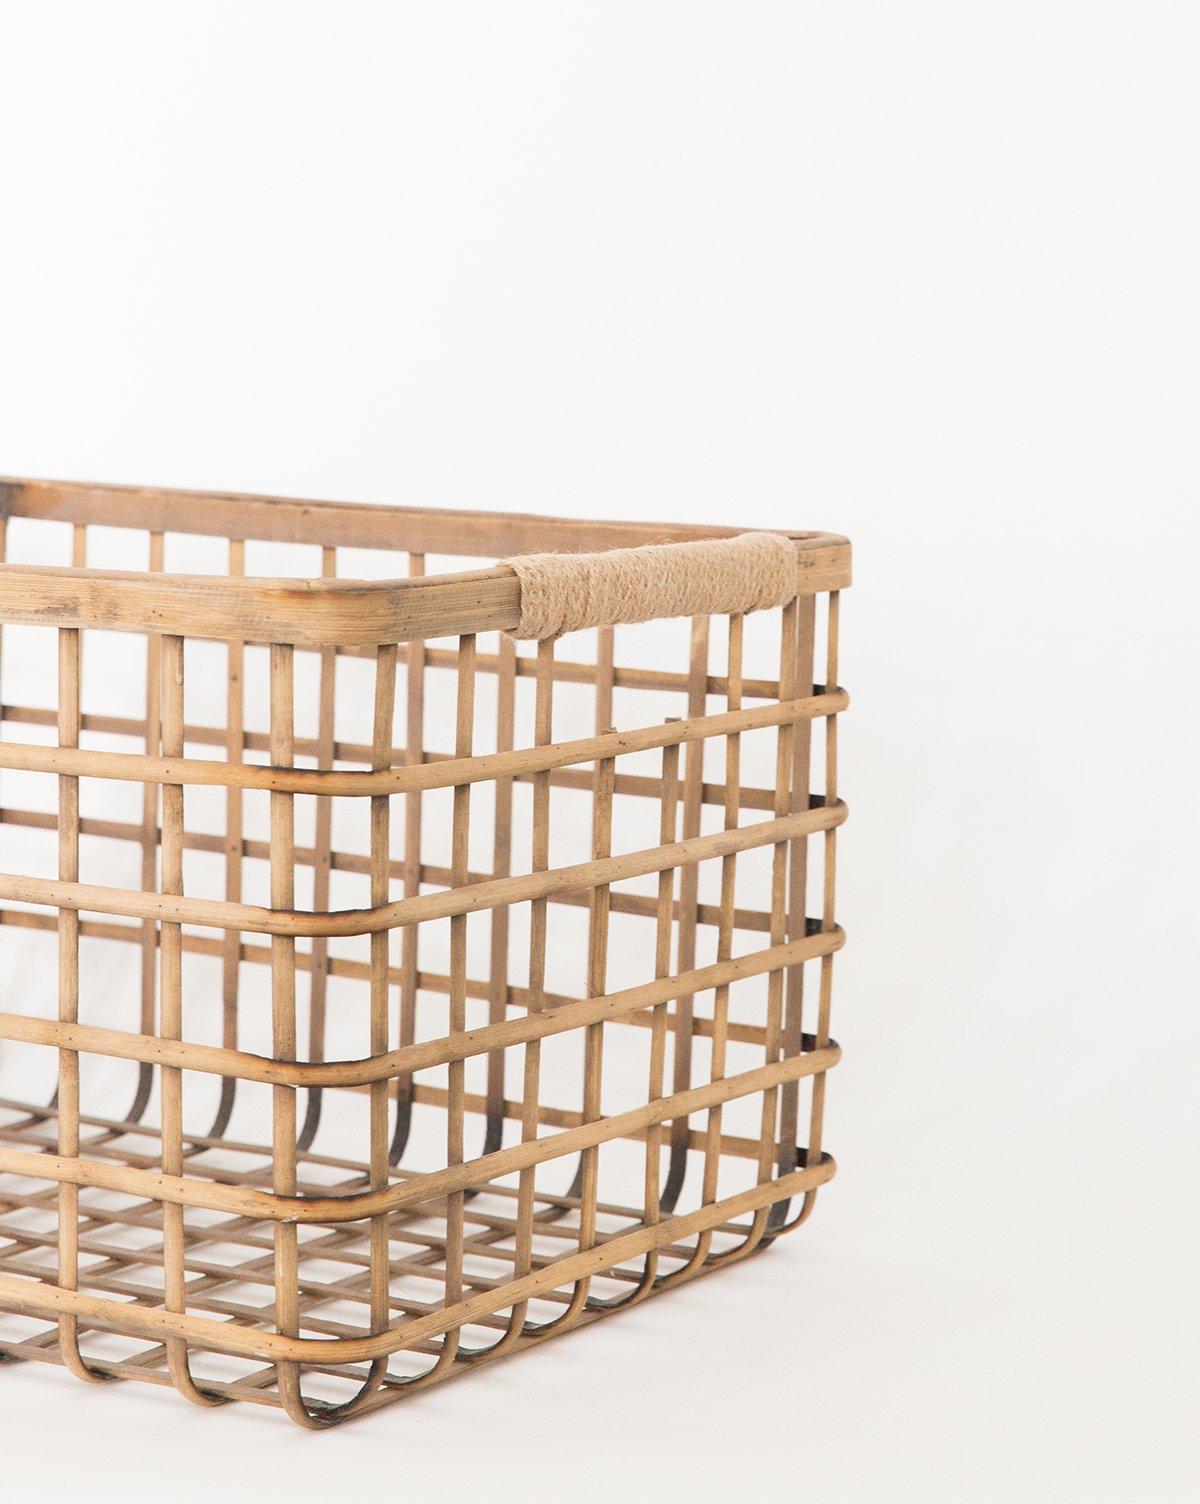 bamboo_river_basket.jpg